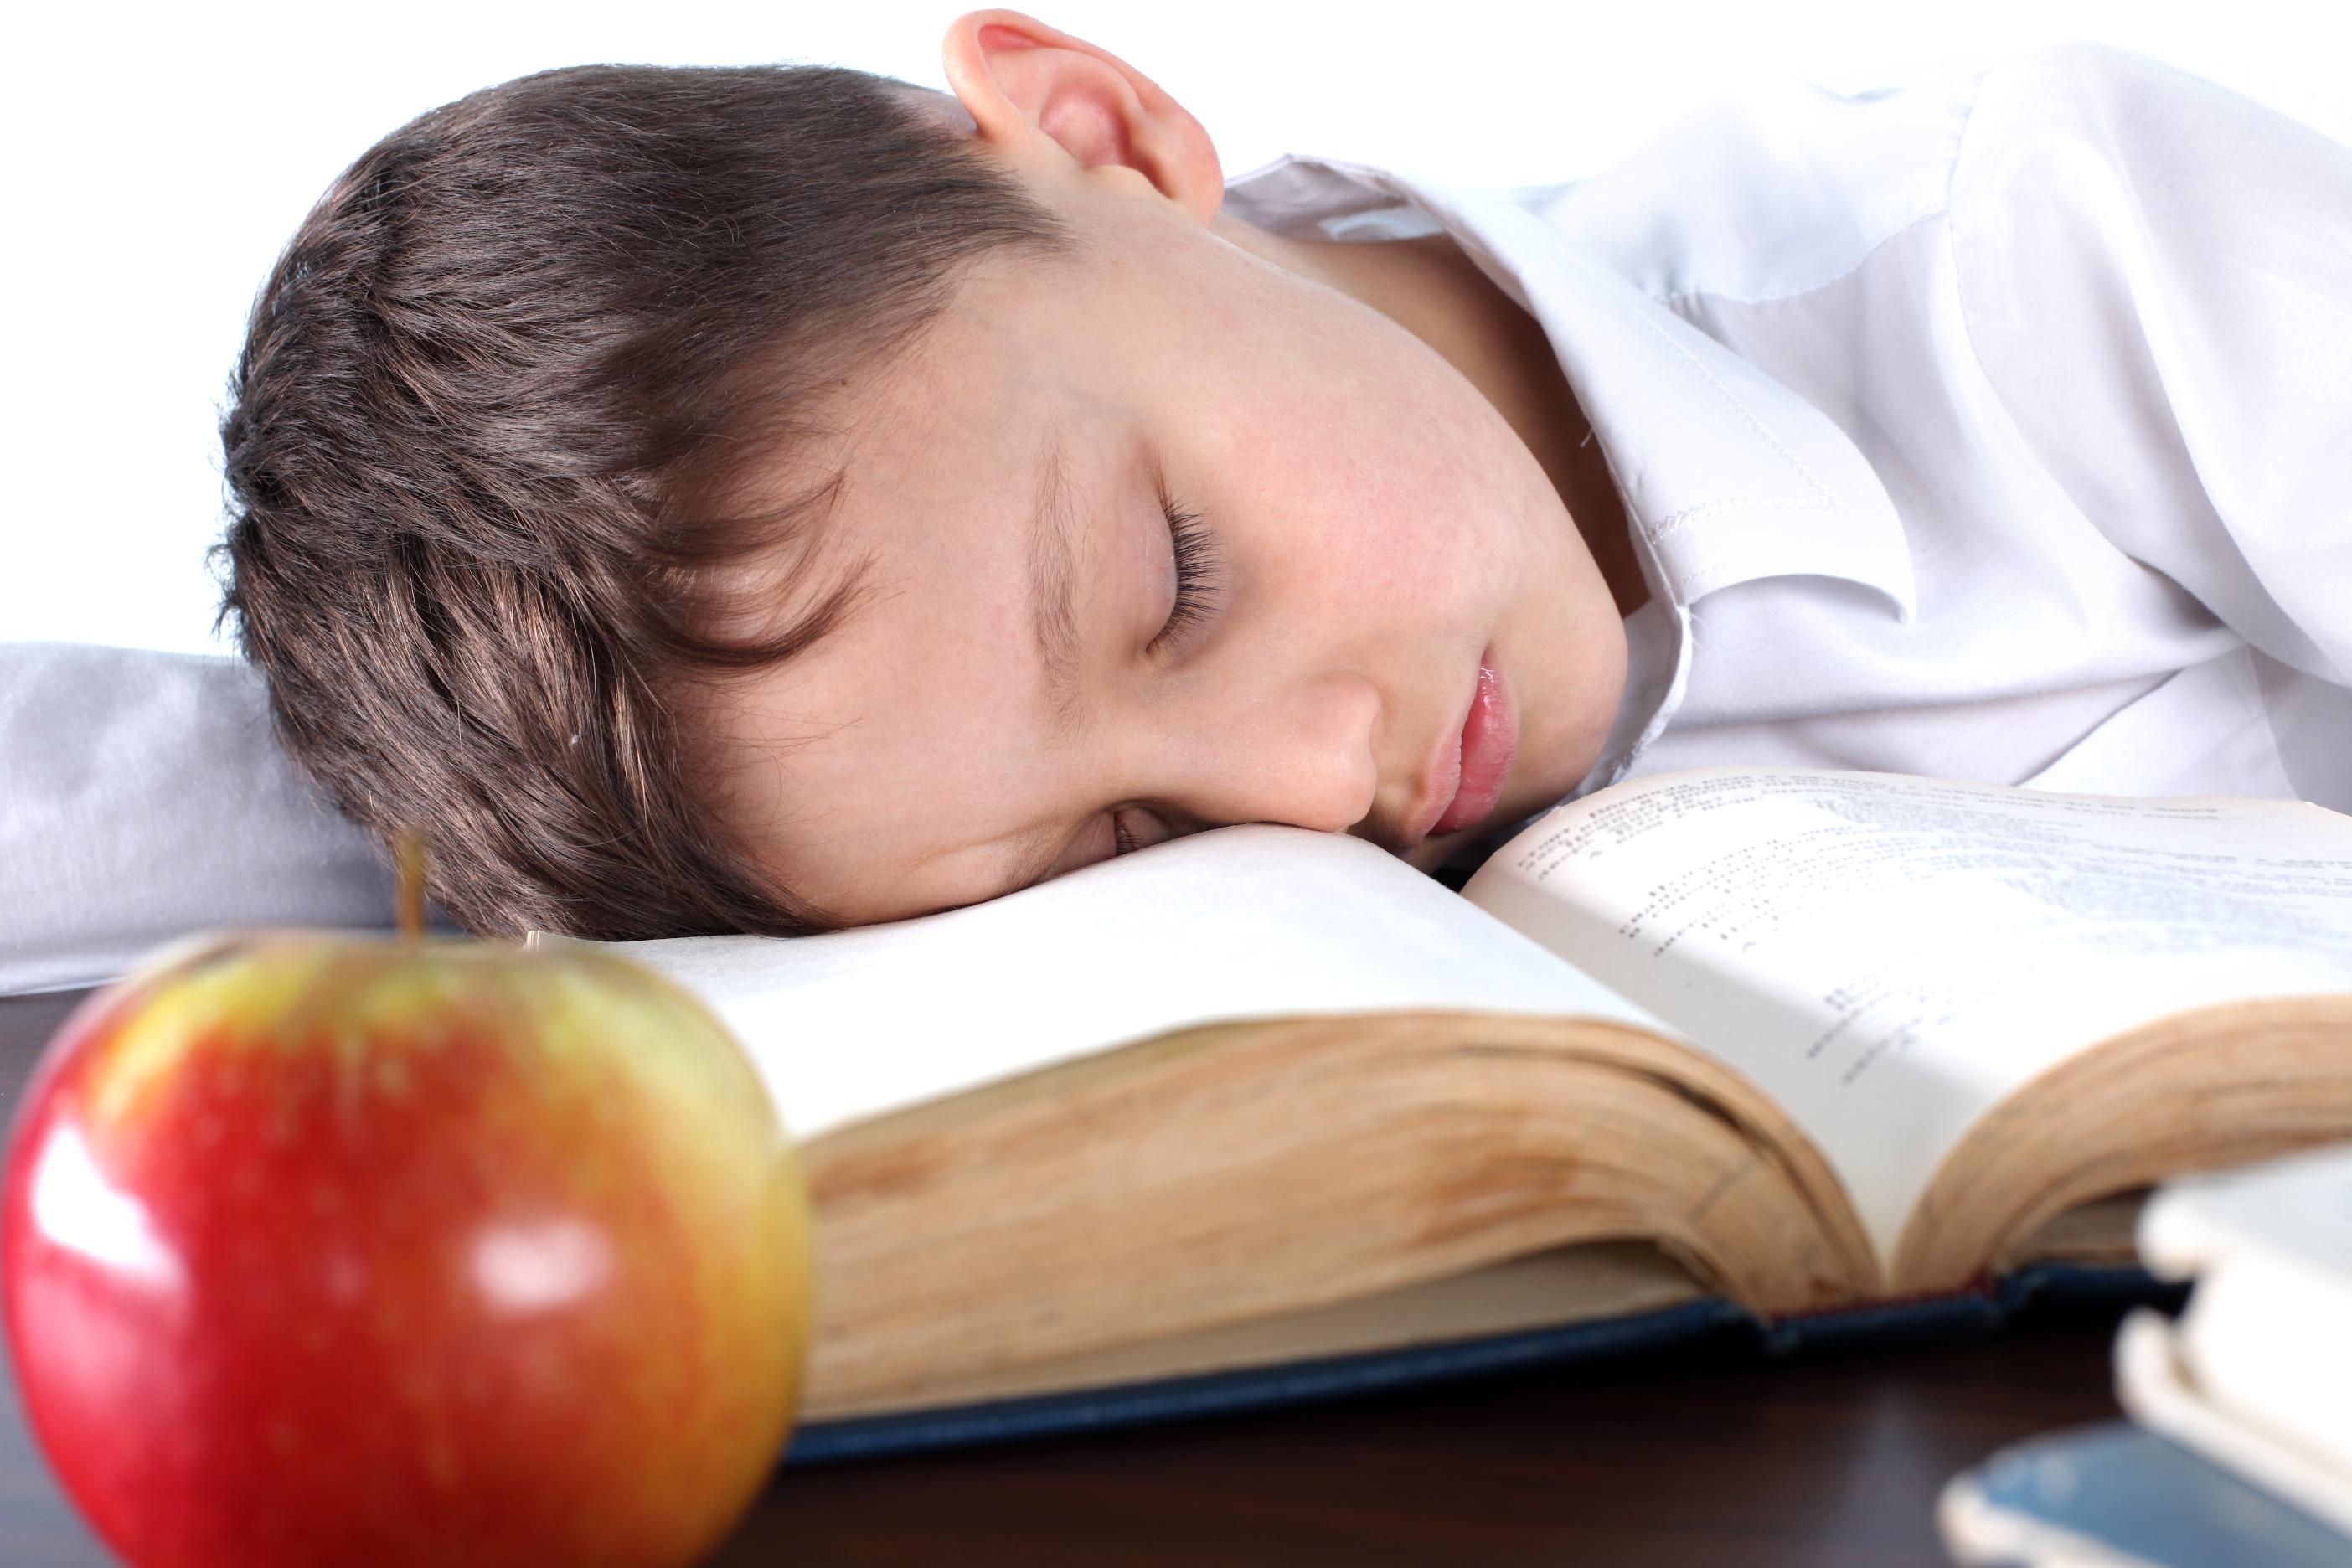 ADHD SYMPTOMS FOR KIDS